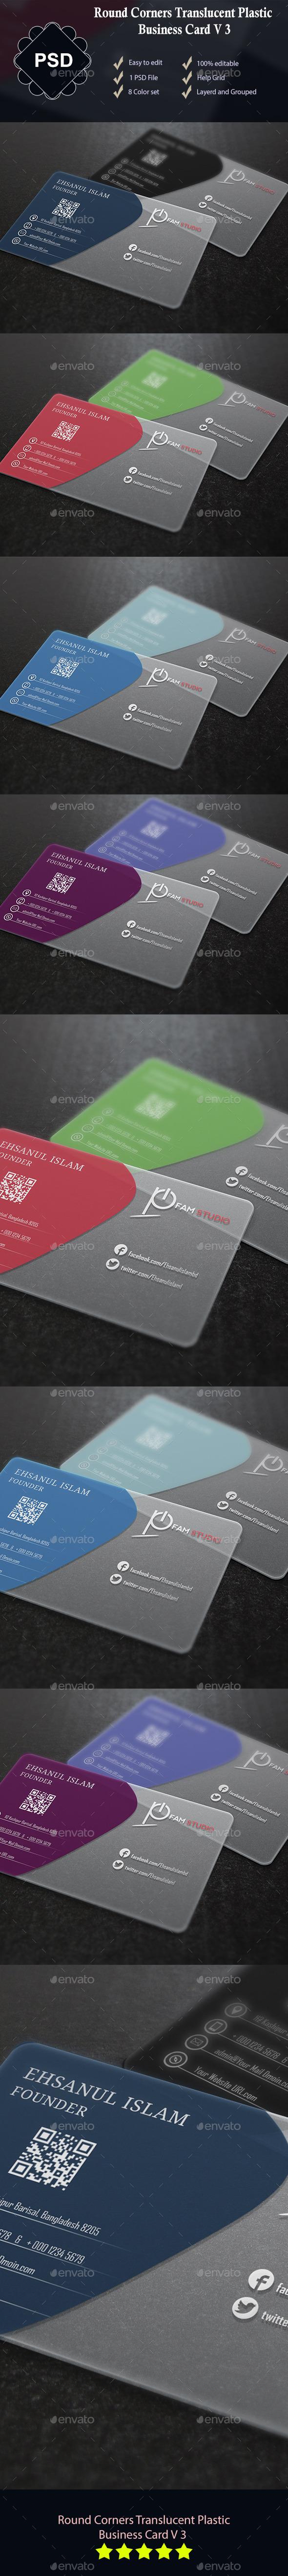 Round Corners  Transparent Plastic Business Card - Creative Business Cards